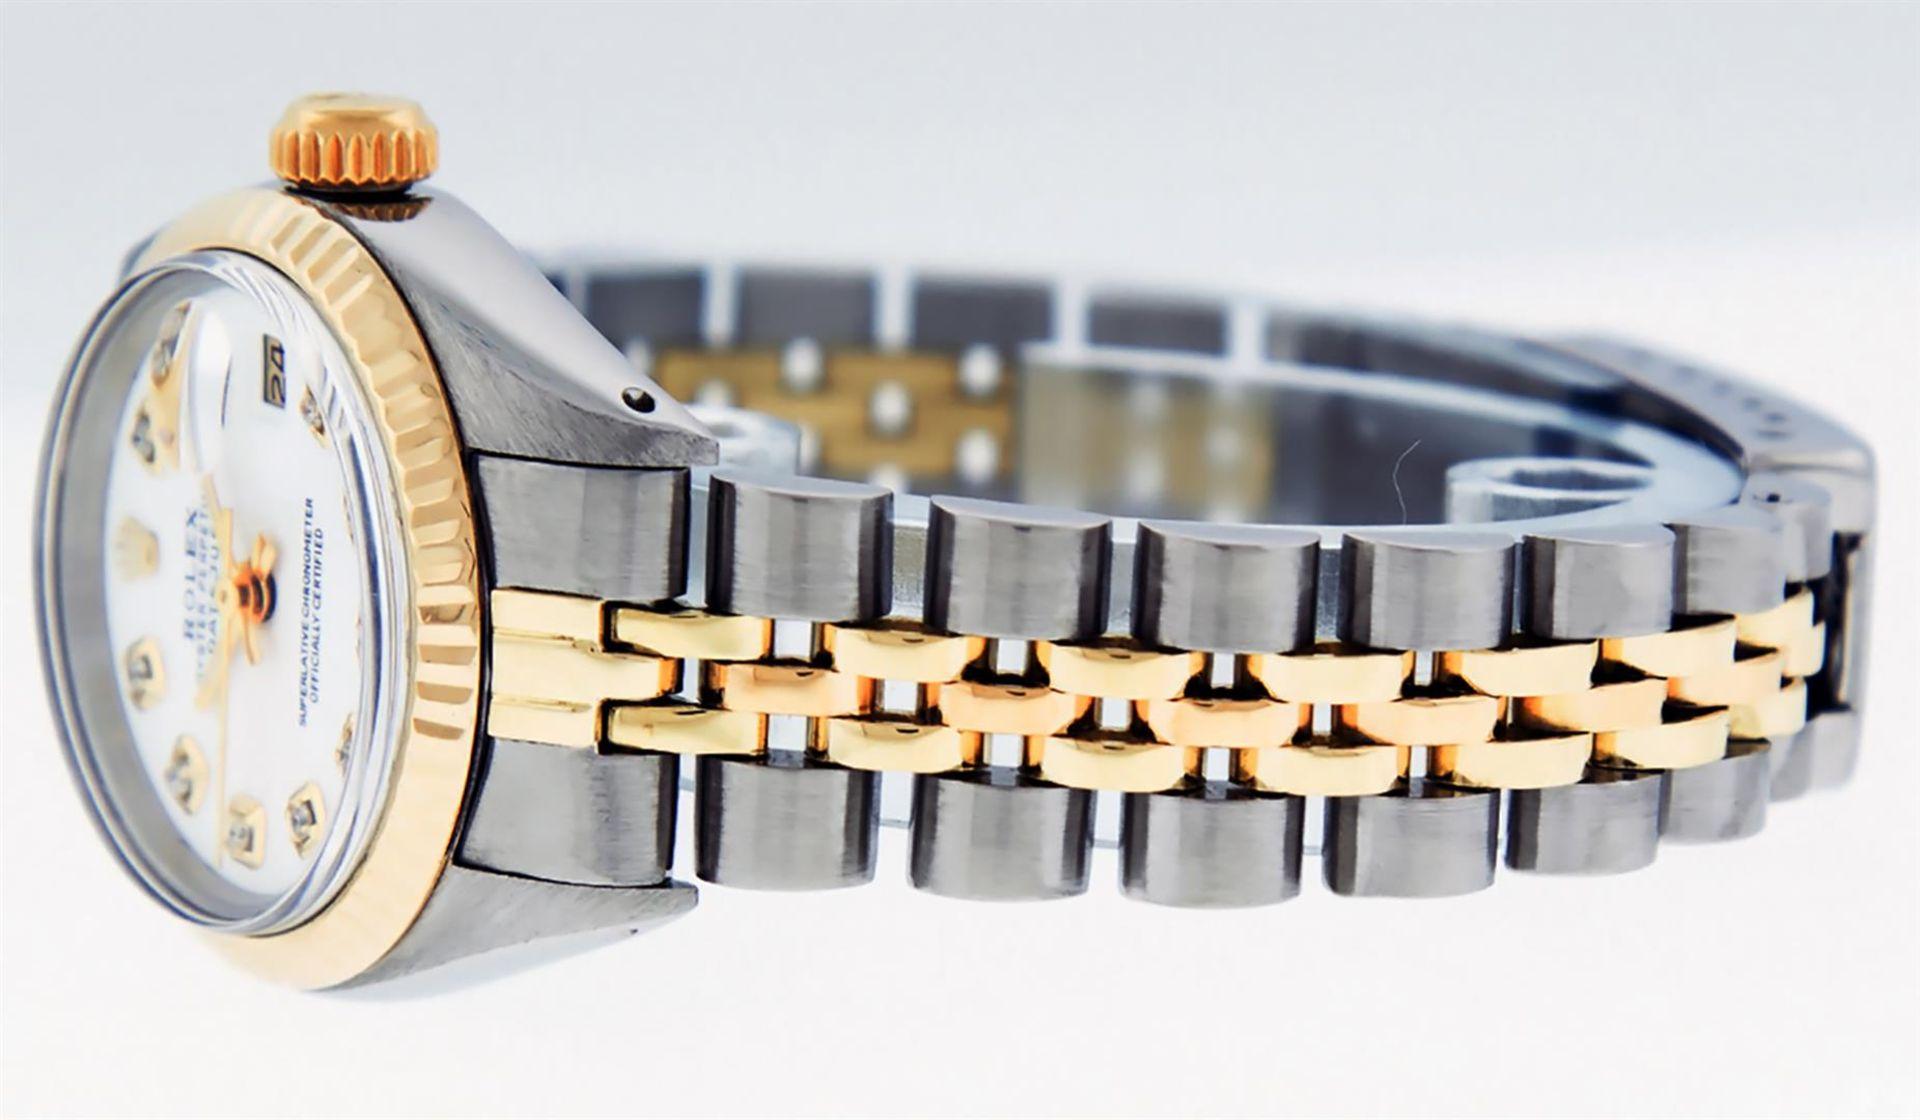 Rolex Ladies 2 Tone White Diamond 26MM Datejust Wristwatch - Image 4 of 8